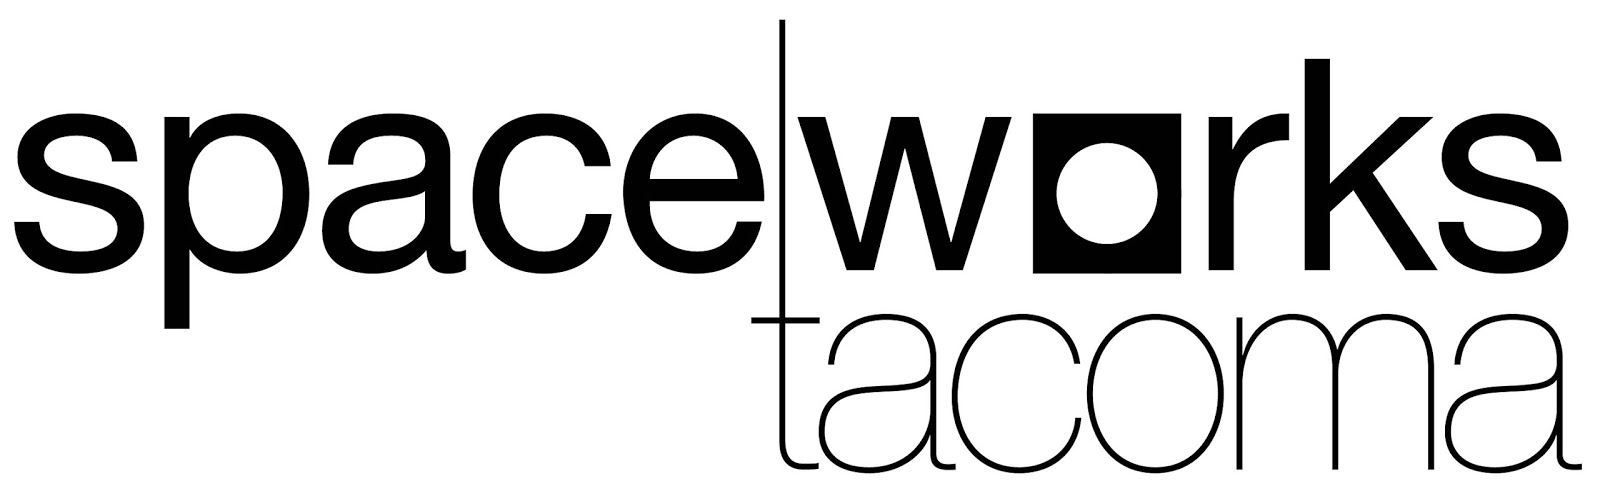 spaceworks_logo_WOwhite.jpg